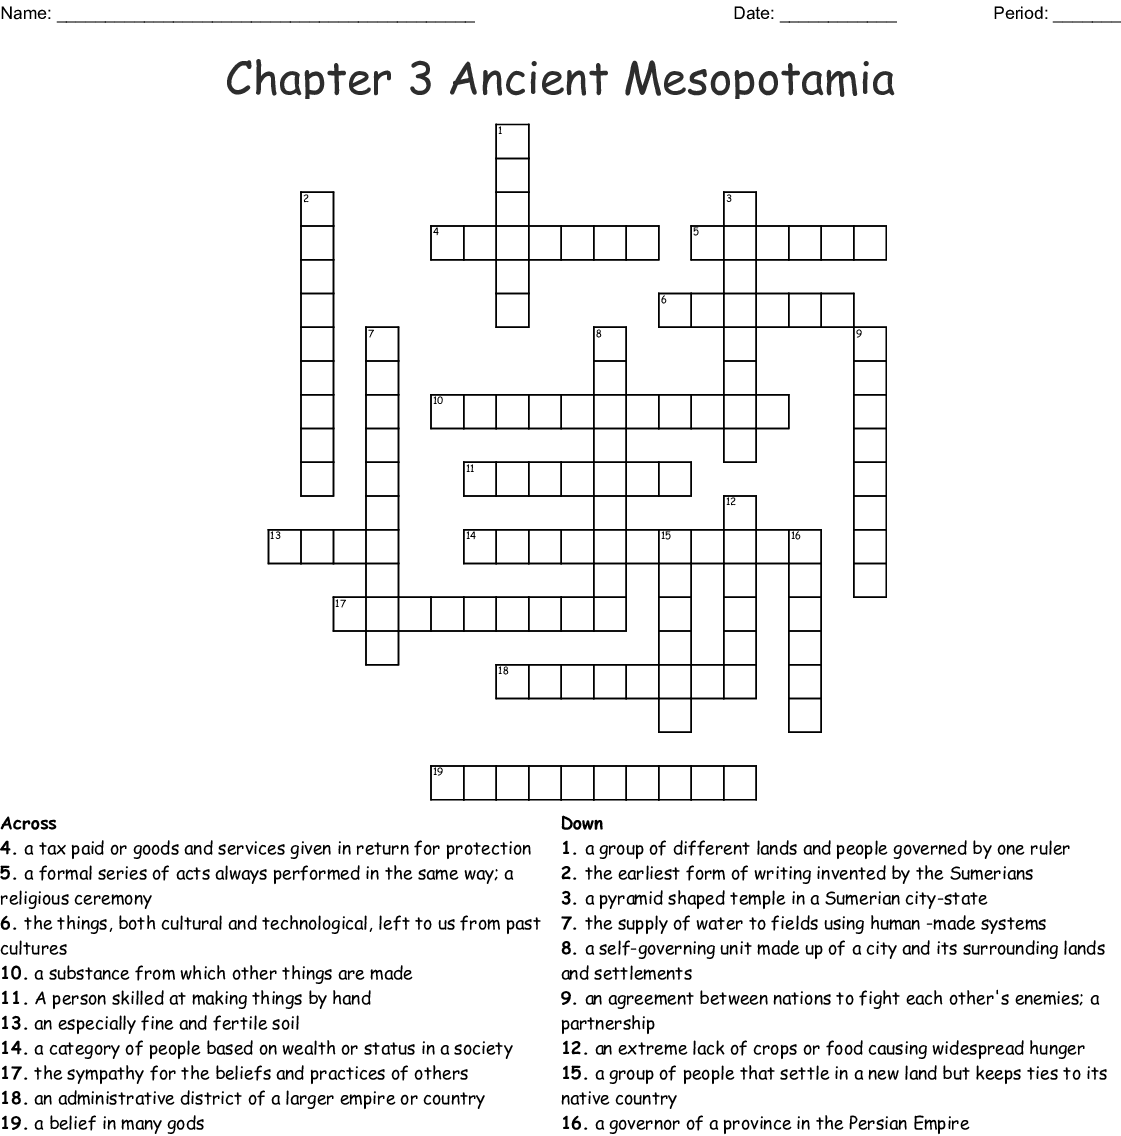 Chapter 3 Ancient Mesopotamia Crossword